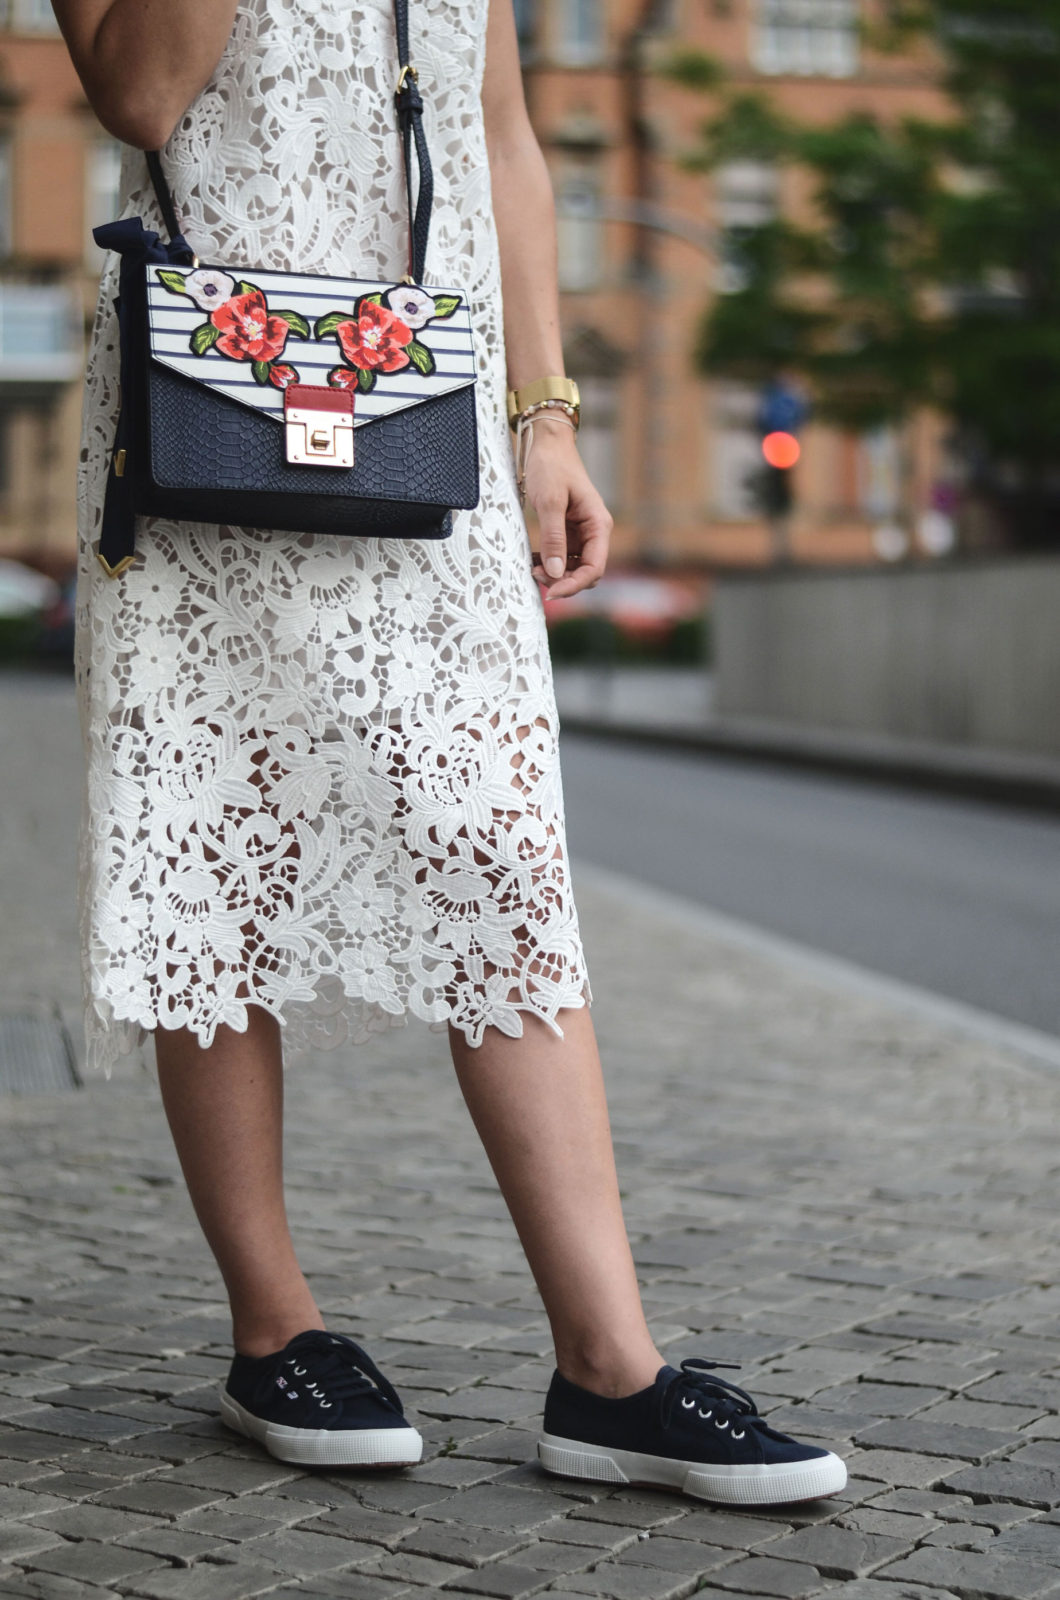 Sariety-modeblog-heidelberg-sarah-czok-fashionblogger-zara-spitzenkleid-superga-aldo-bag-15